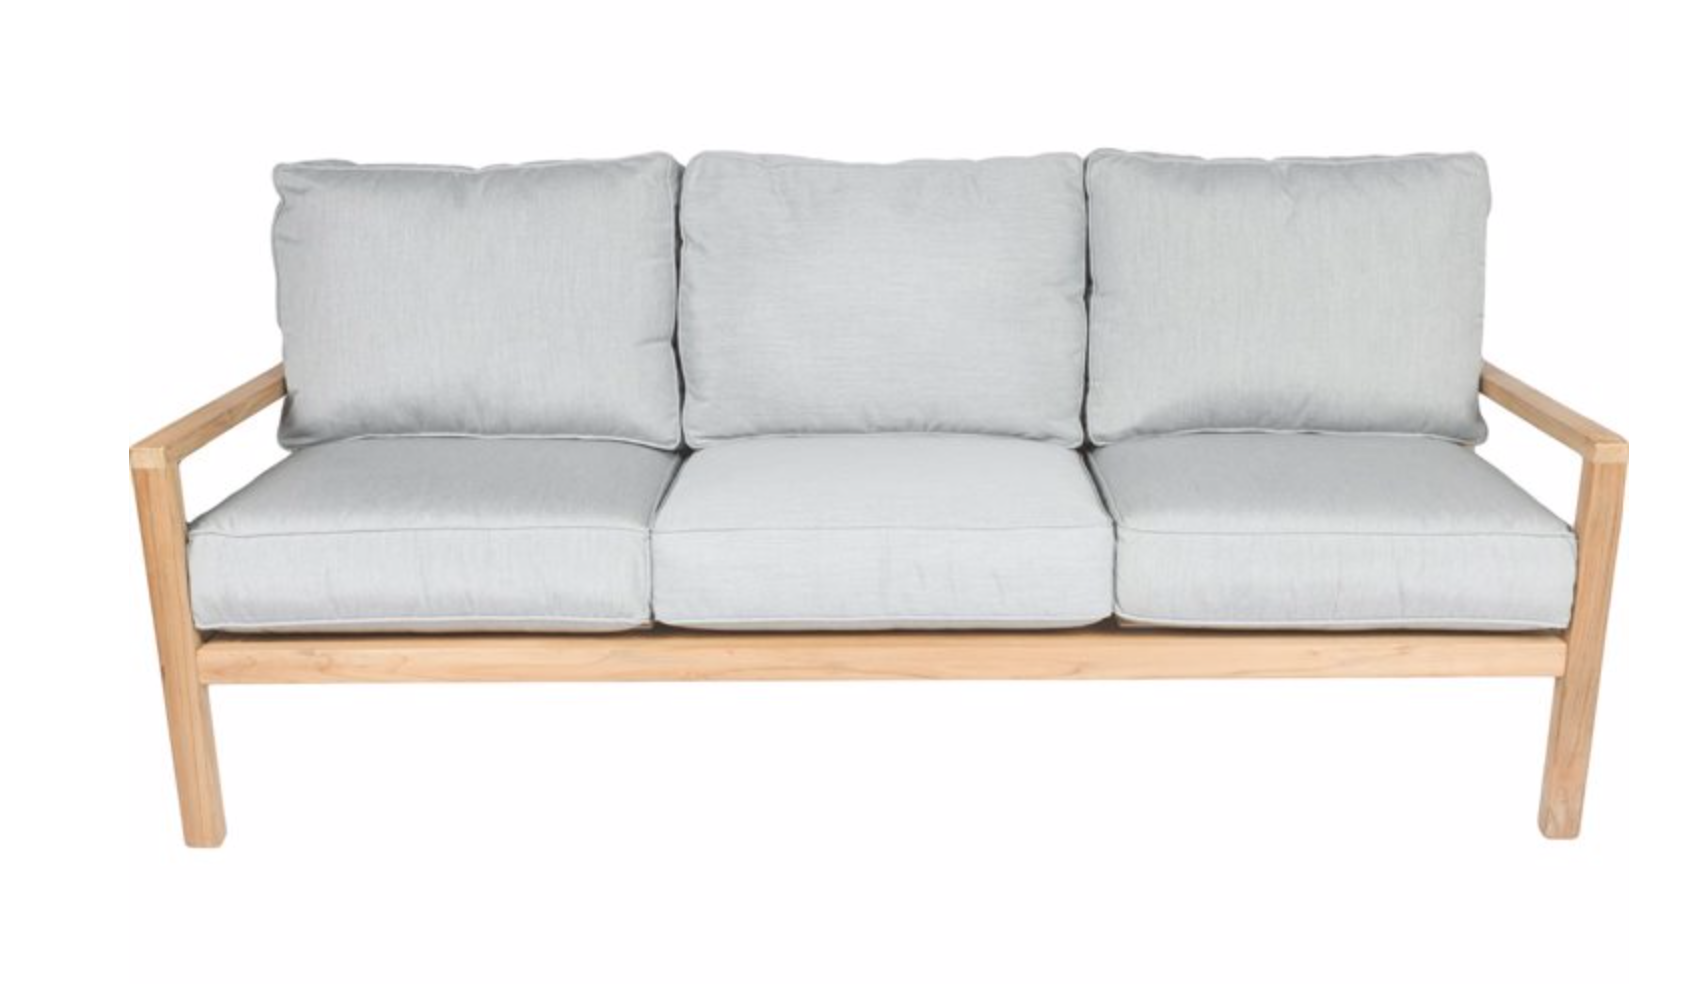 Royal Teak Collection Coastal Sofa 3 Seater Outdoor